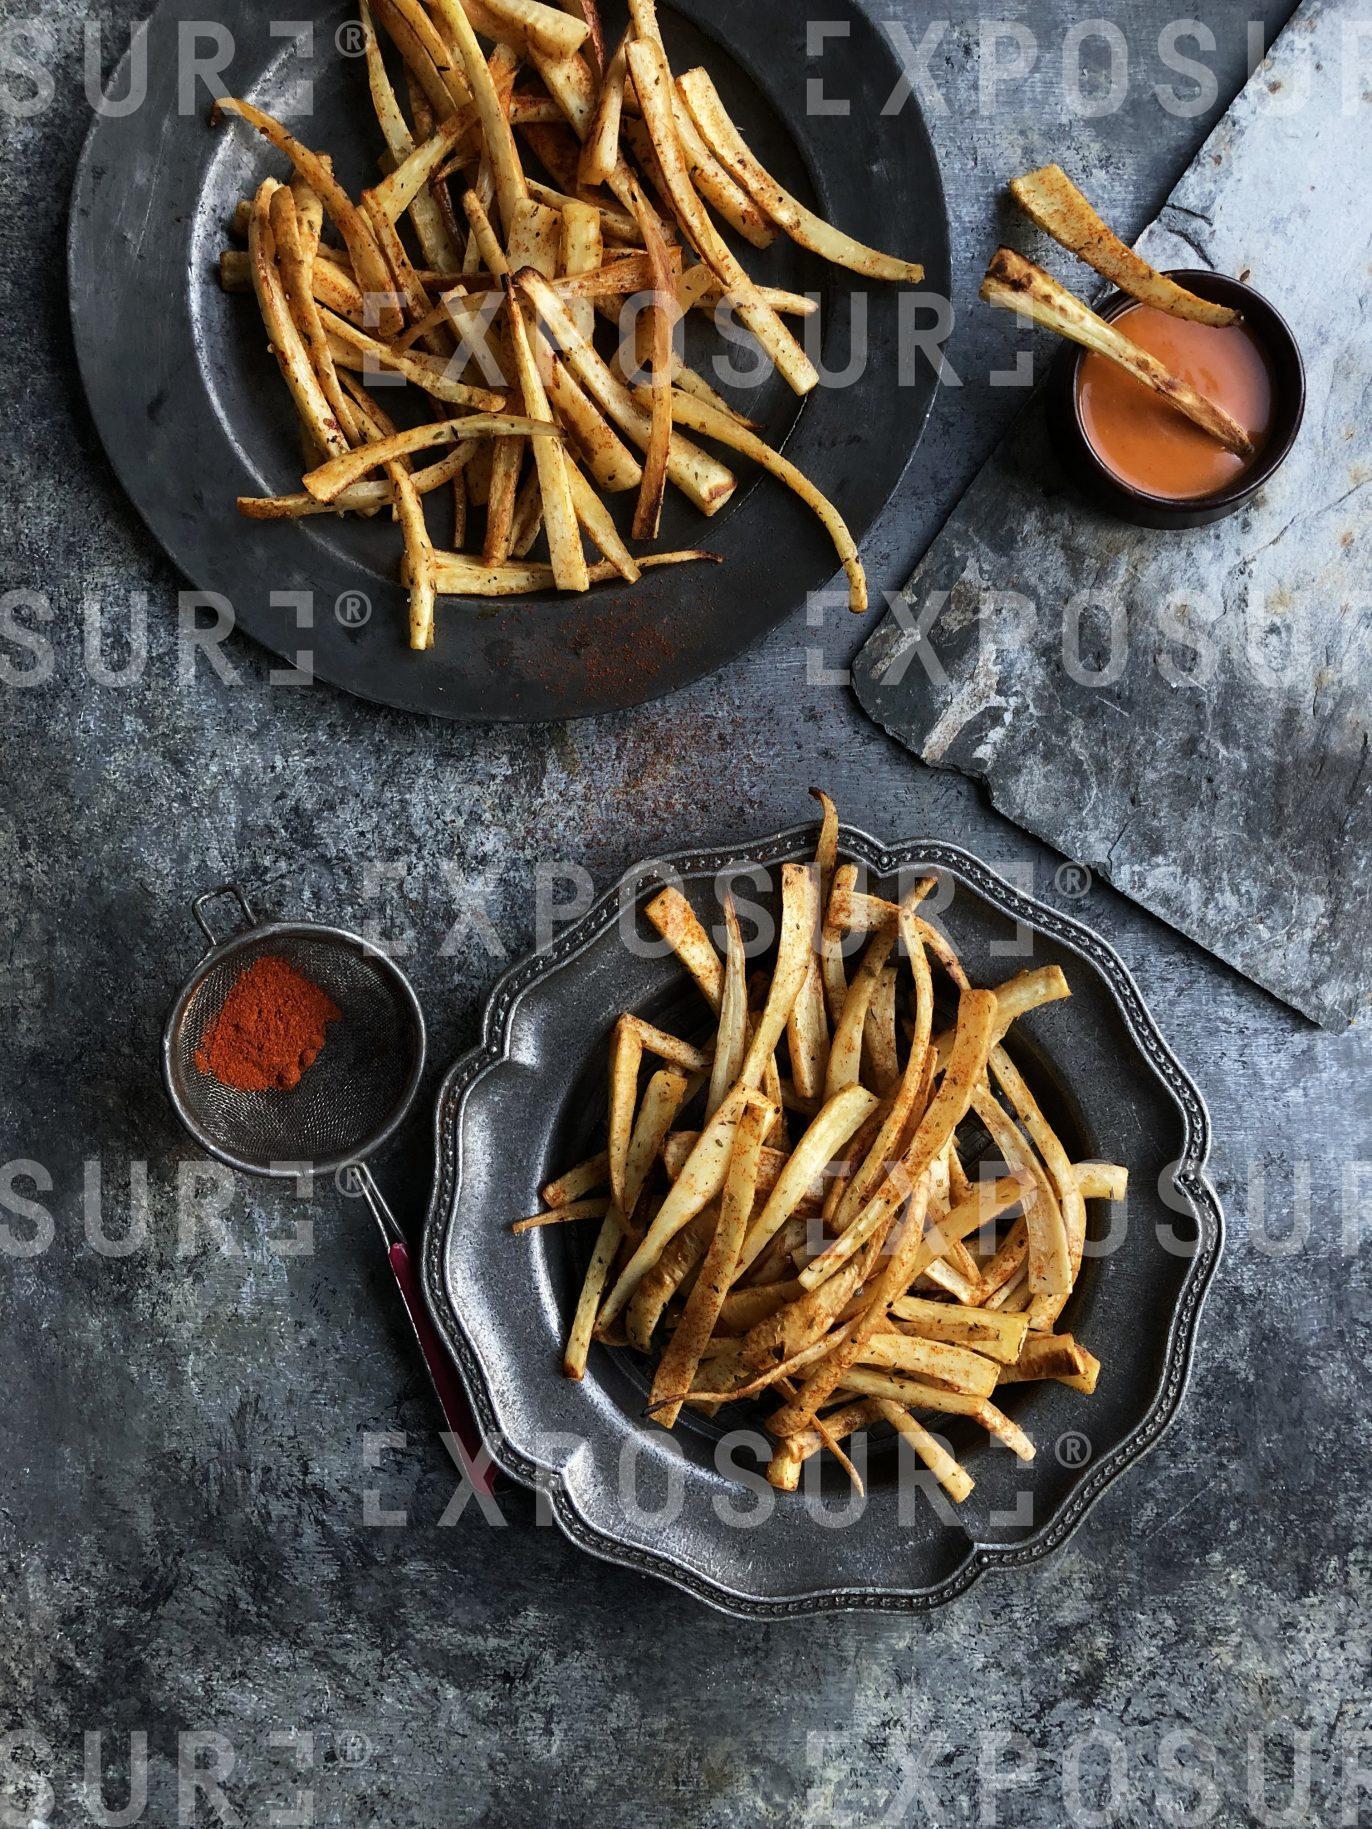 Parsnip fries with sriracha mayo